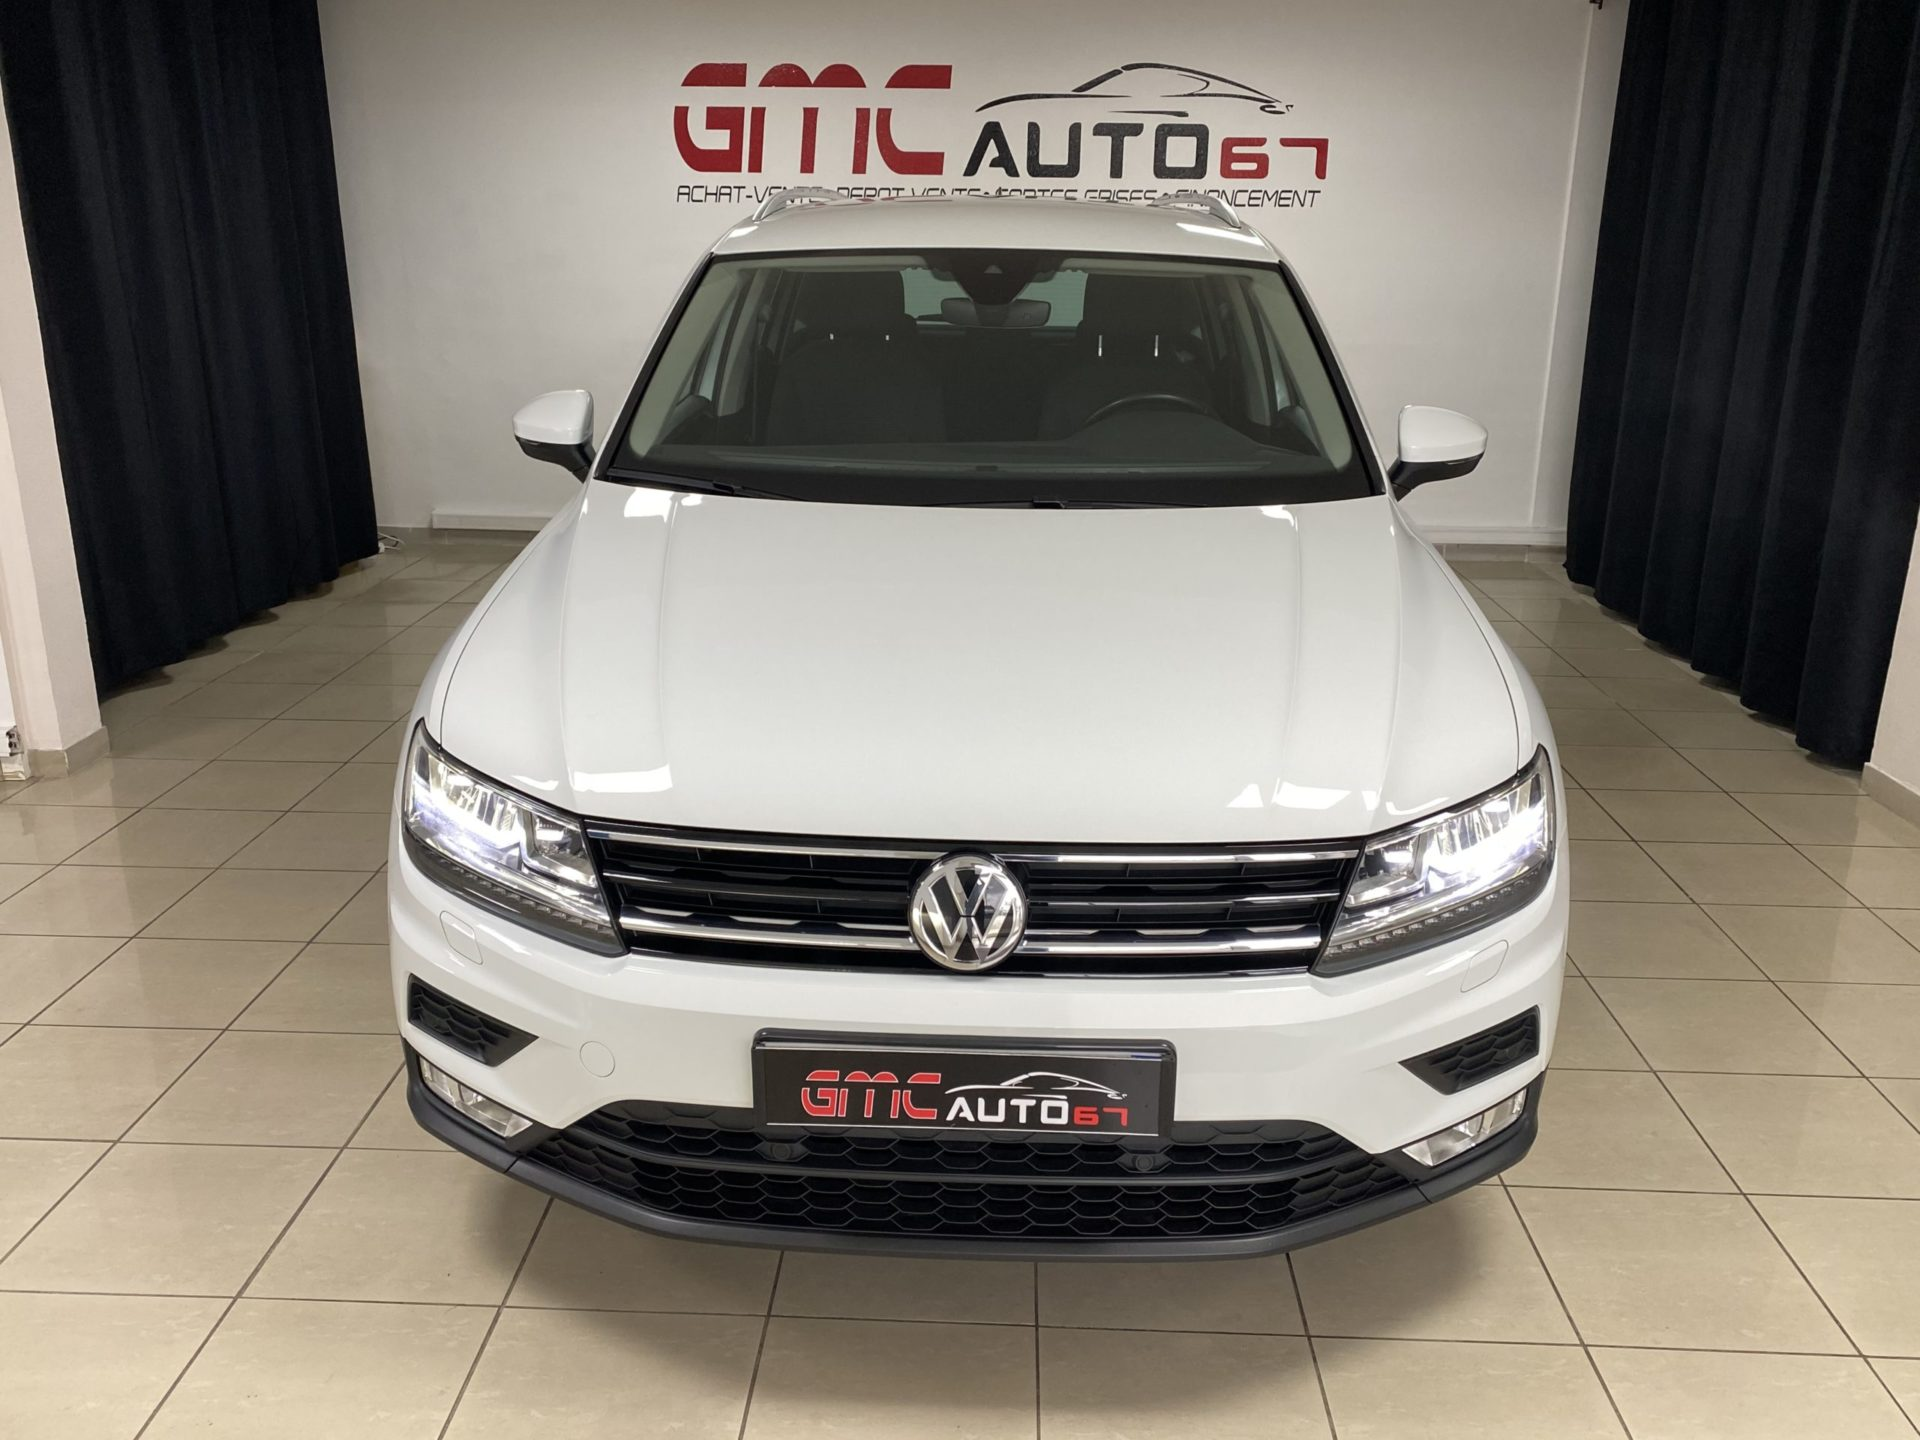 GMC AUTO 67 - Volkswagen TIGUAN 1.4 TSI 150 BlueMotion Technology DSG6 SOUND